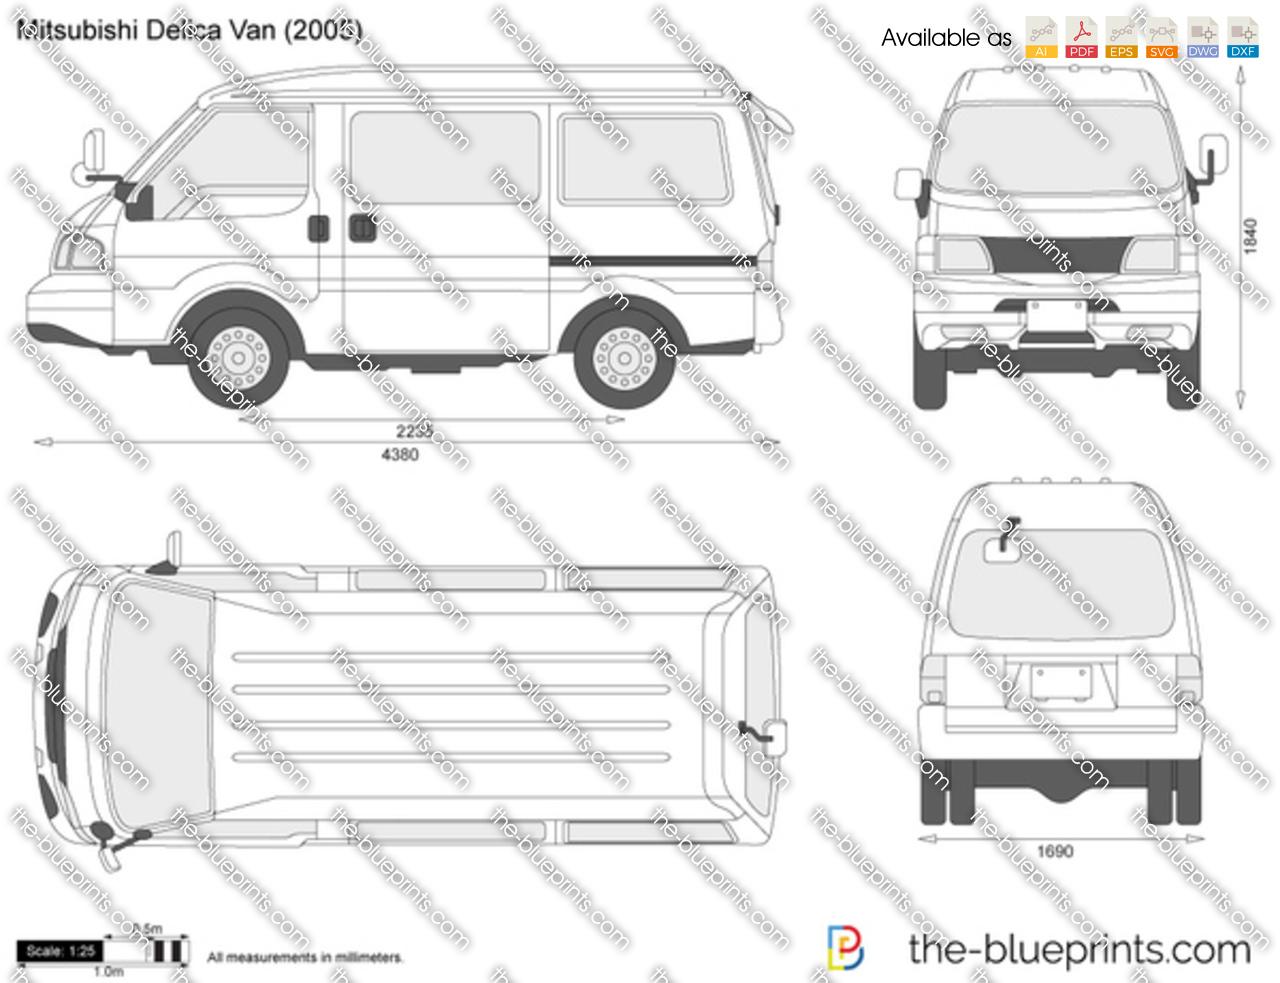 Mitsubishi Delica Van 1987